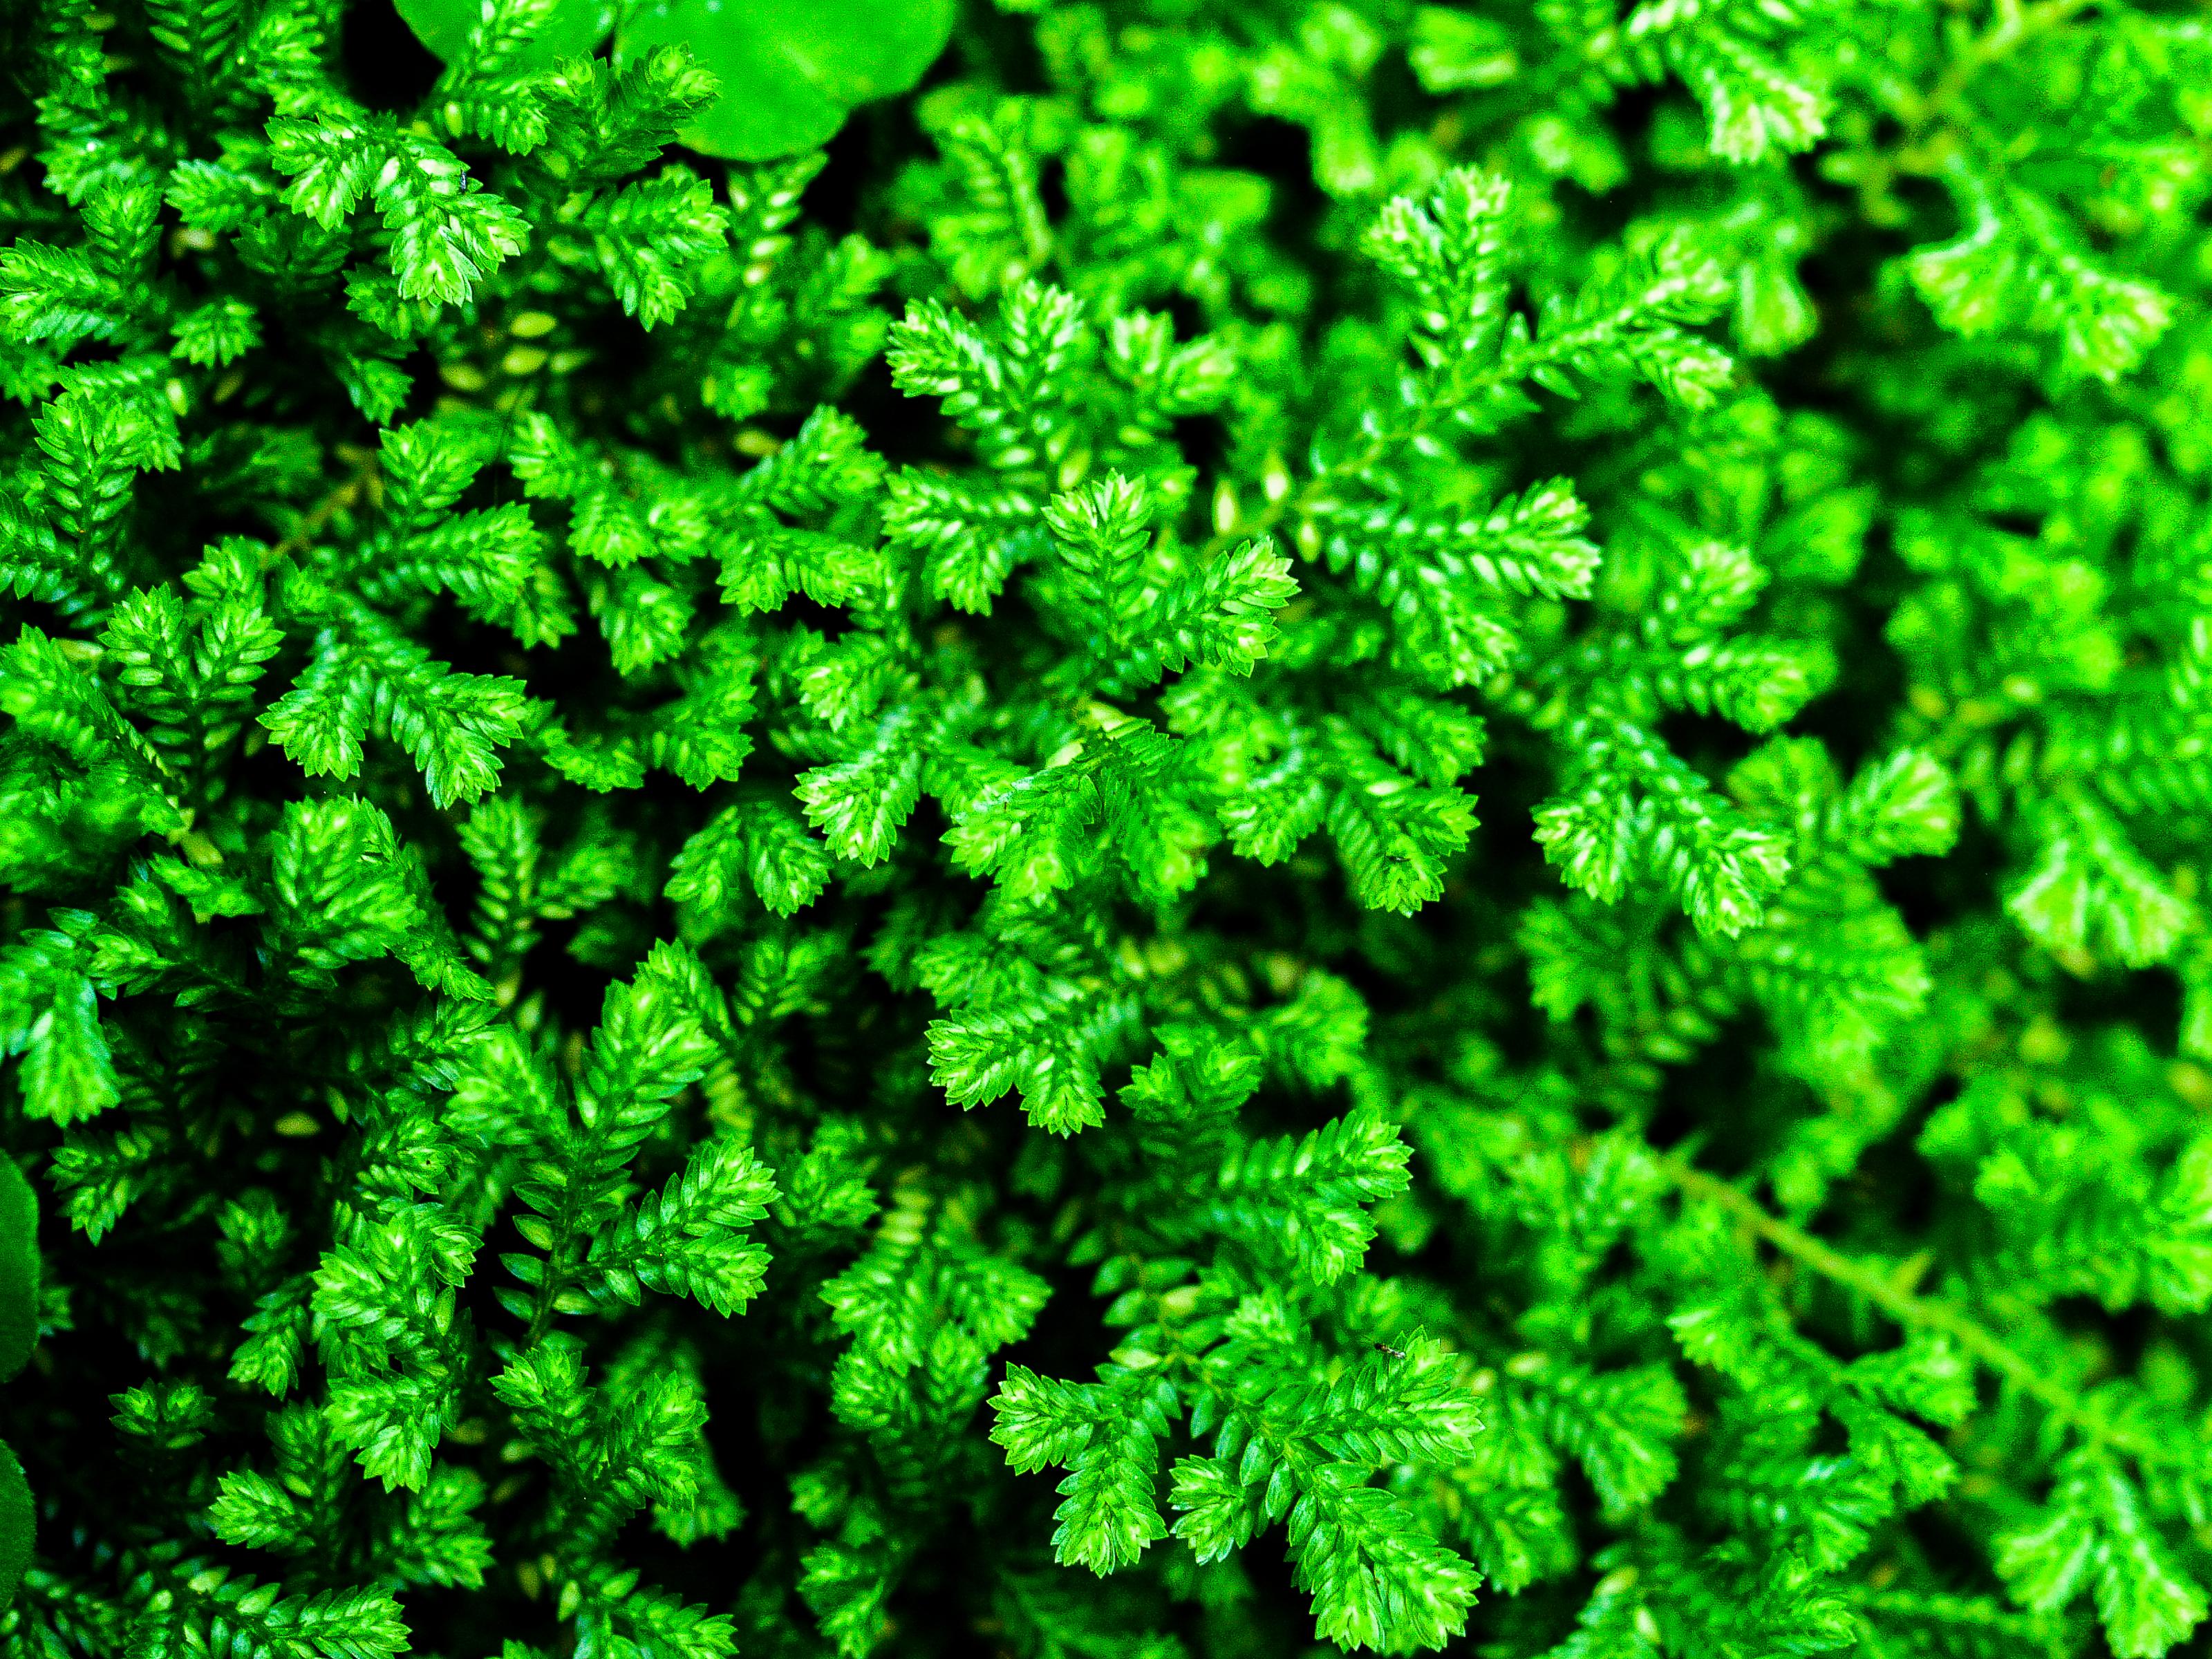 Free Images Green, Natural, Flora, Leaf, Nature, Tropical, Fern, Background,